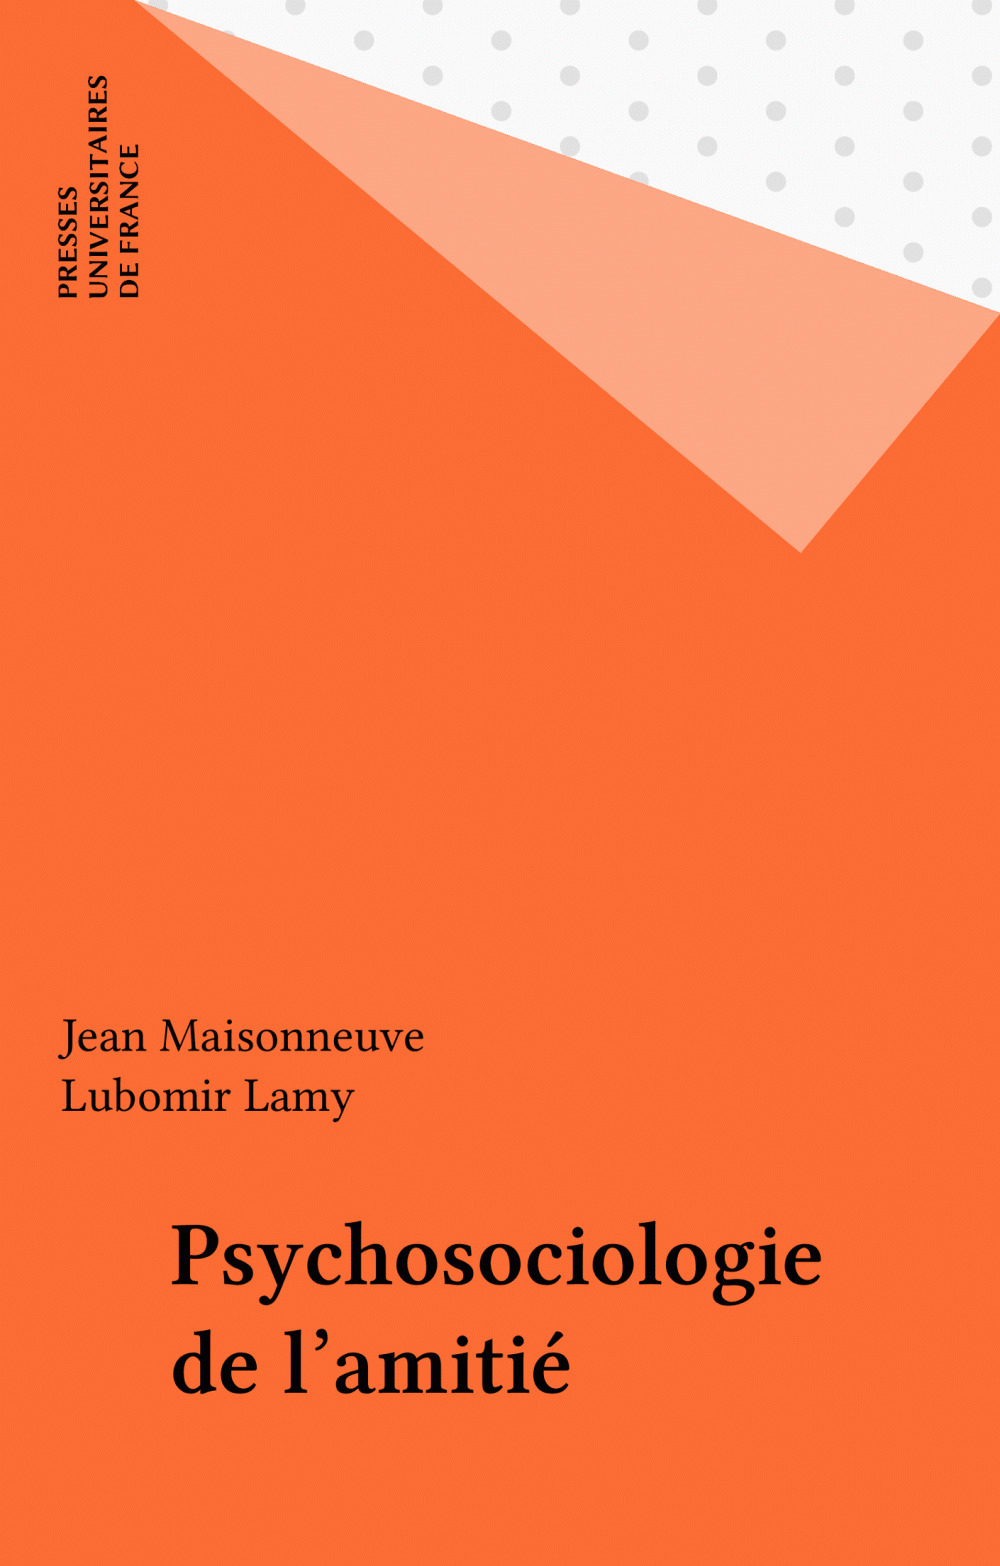 Psychosociologie de l'amitié